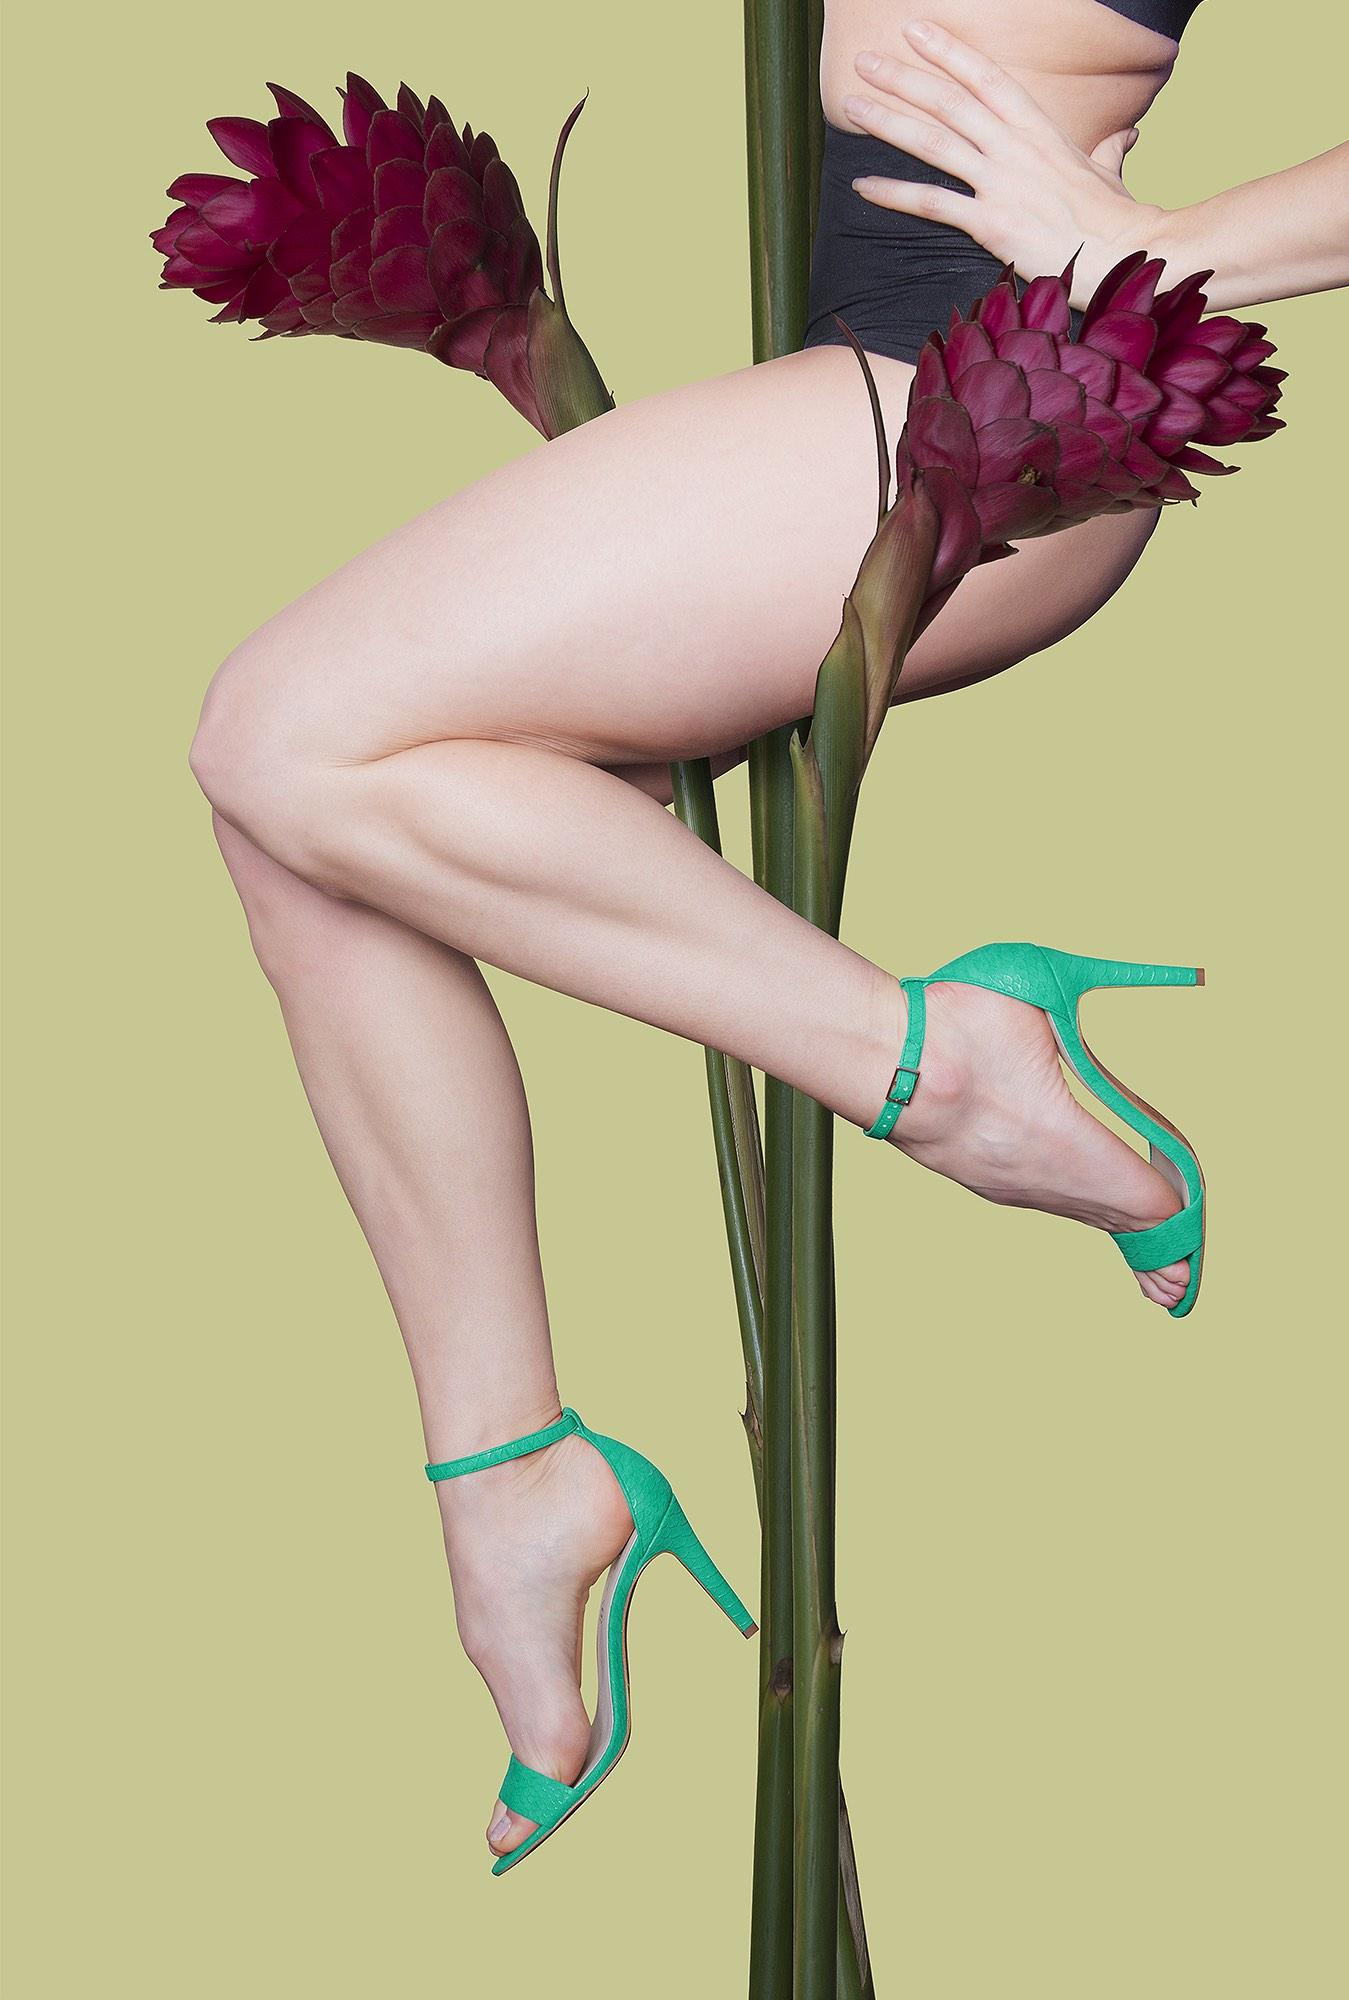 pauline-sherrow_feet5